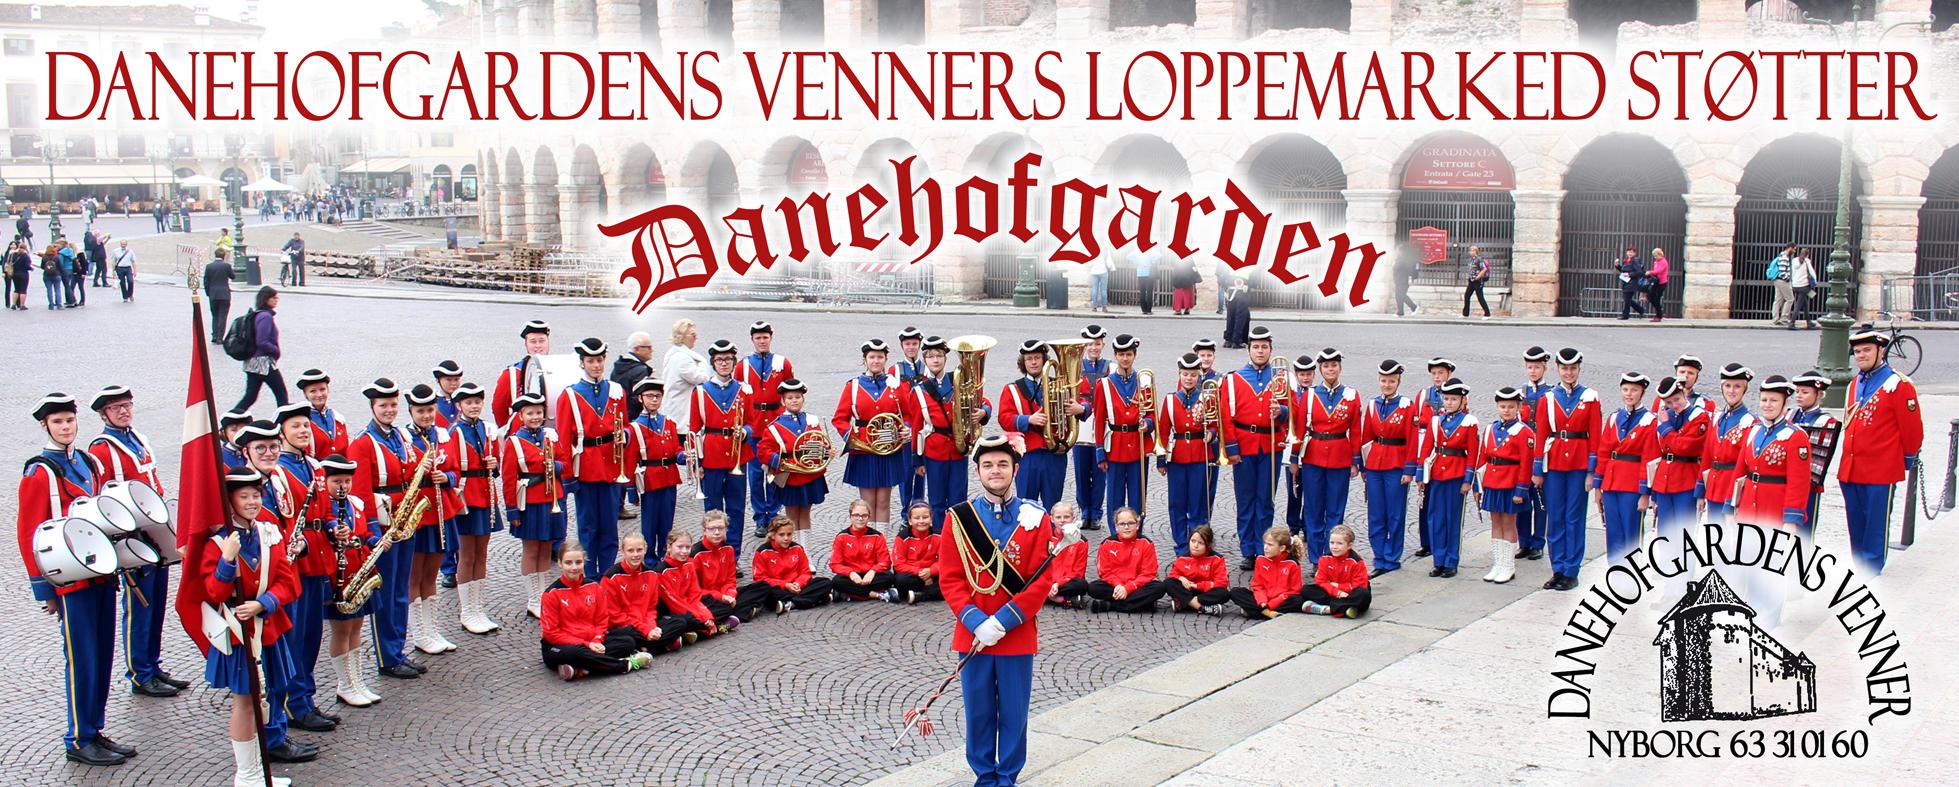 Danehofgardens Venner